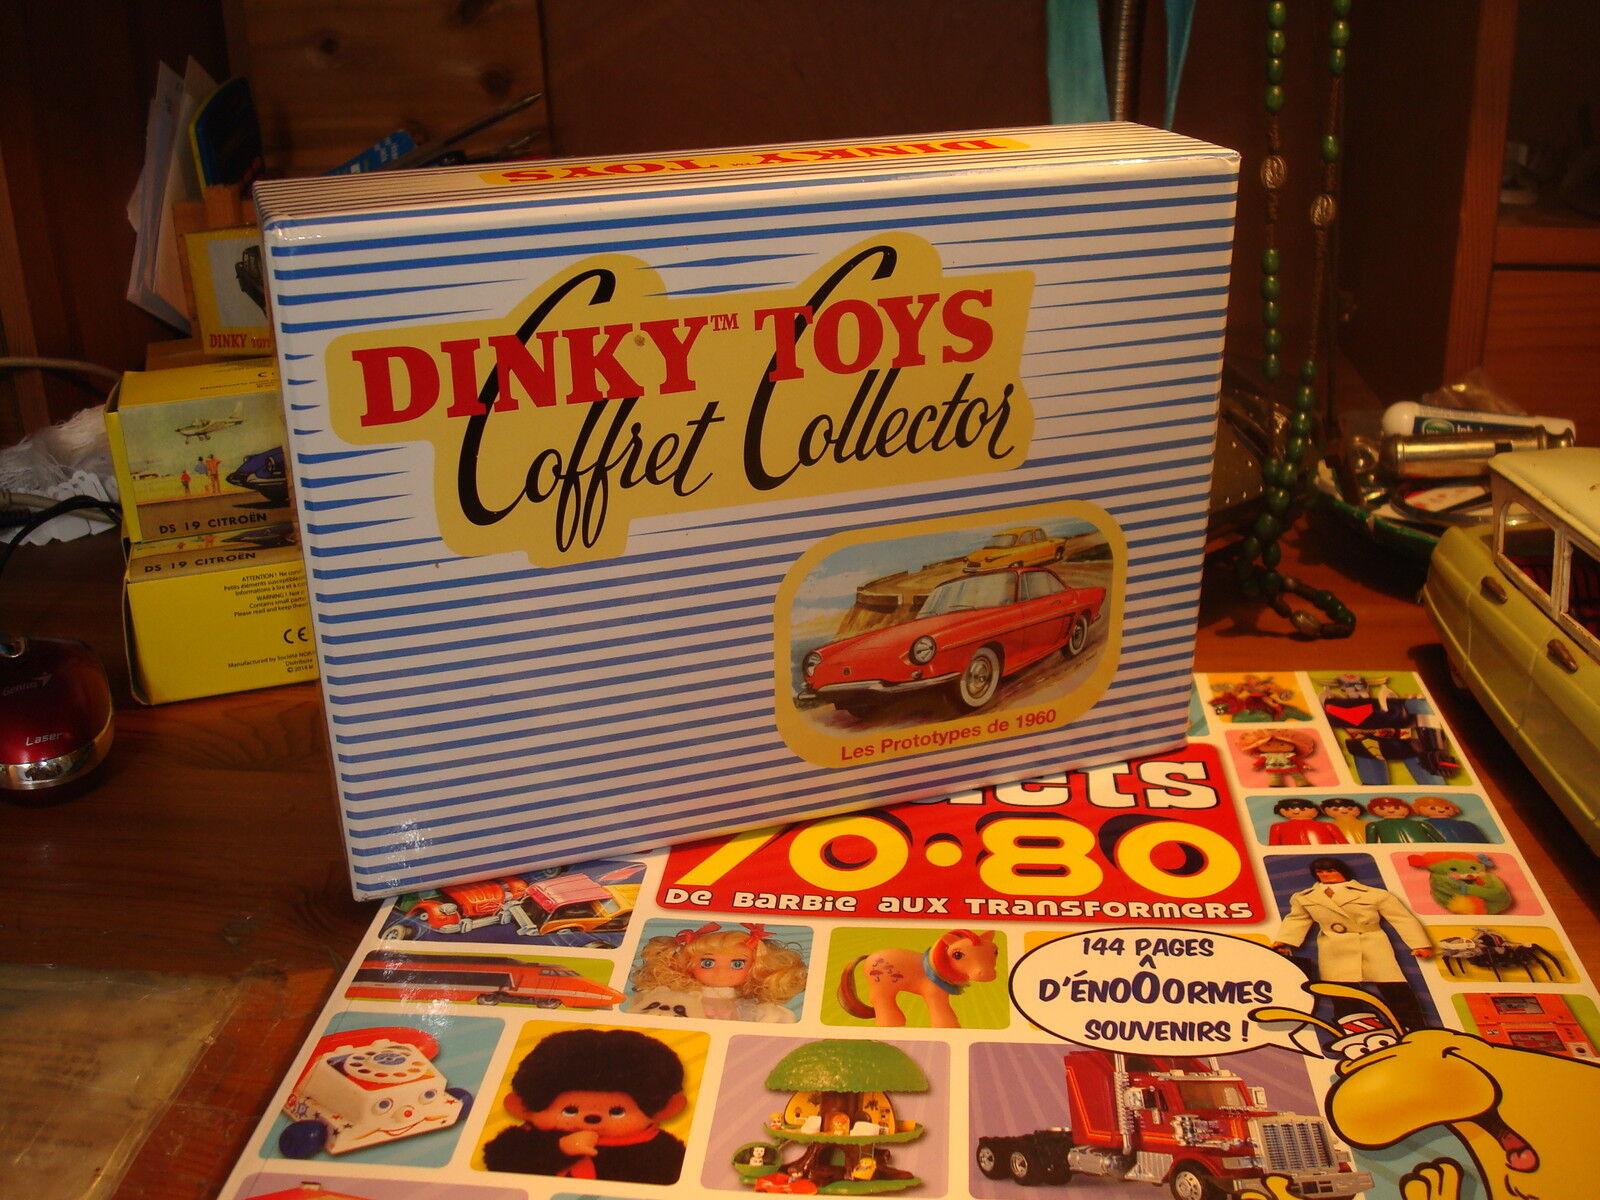 DINKY TOYS ATLAS  COFFRET COLLECTOR  N° 500.60  LES ProjoOTYPES DE 1960